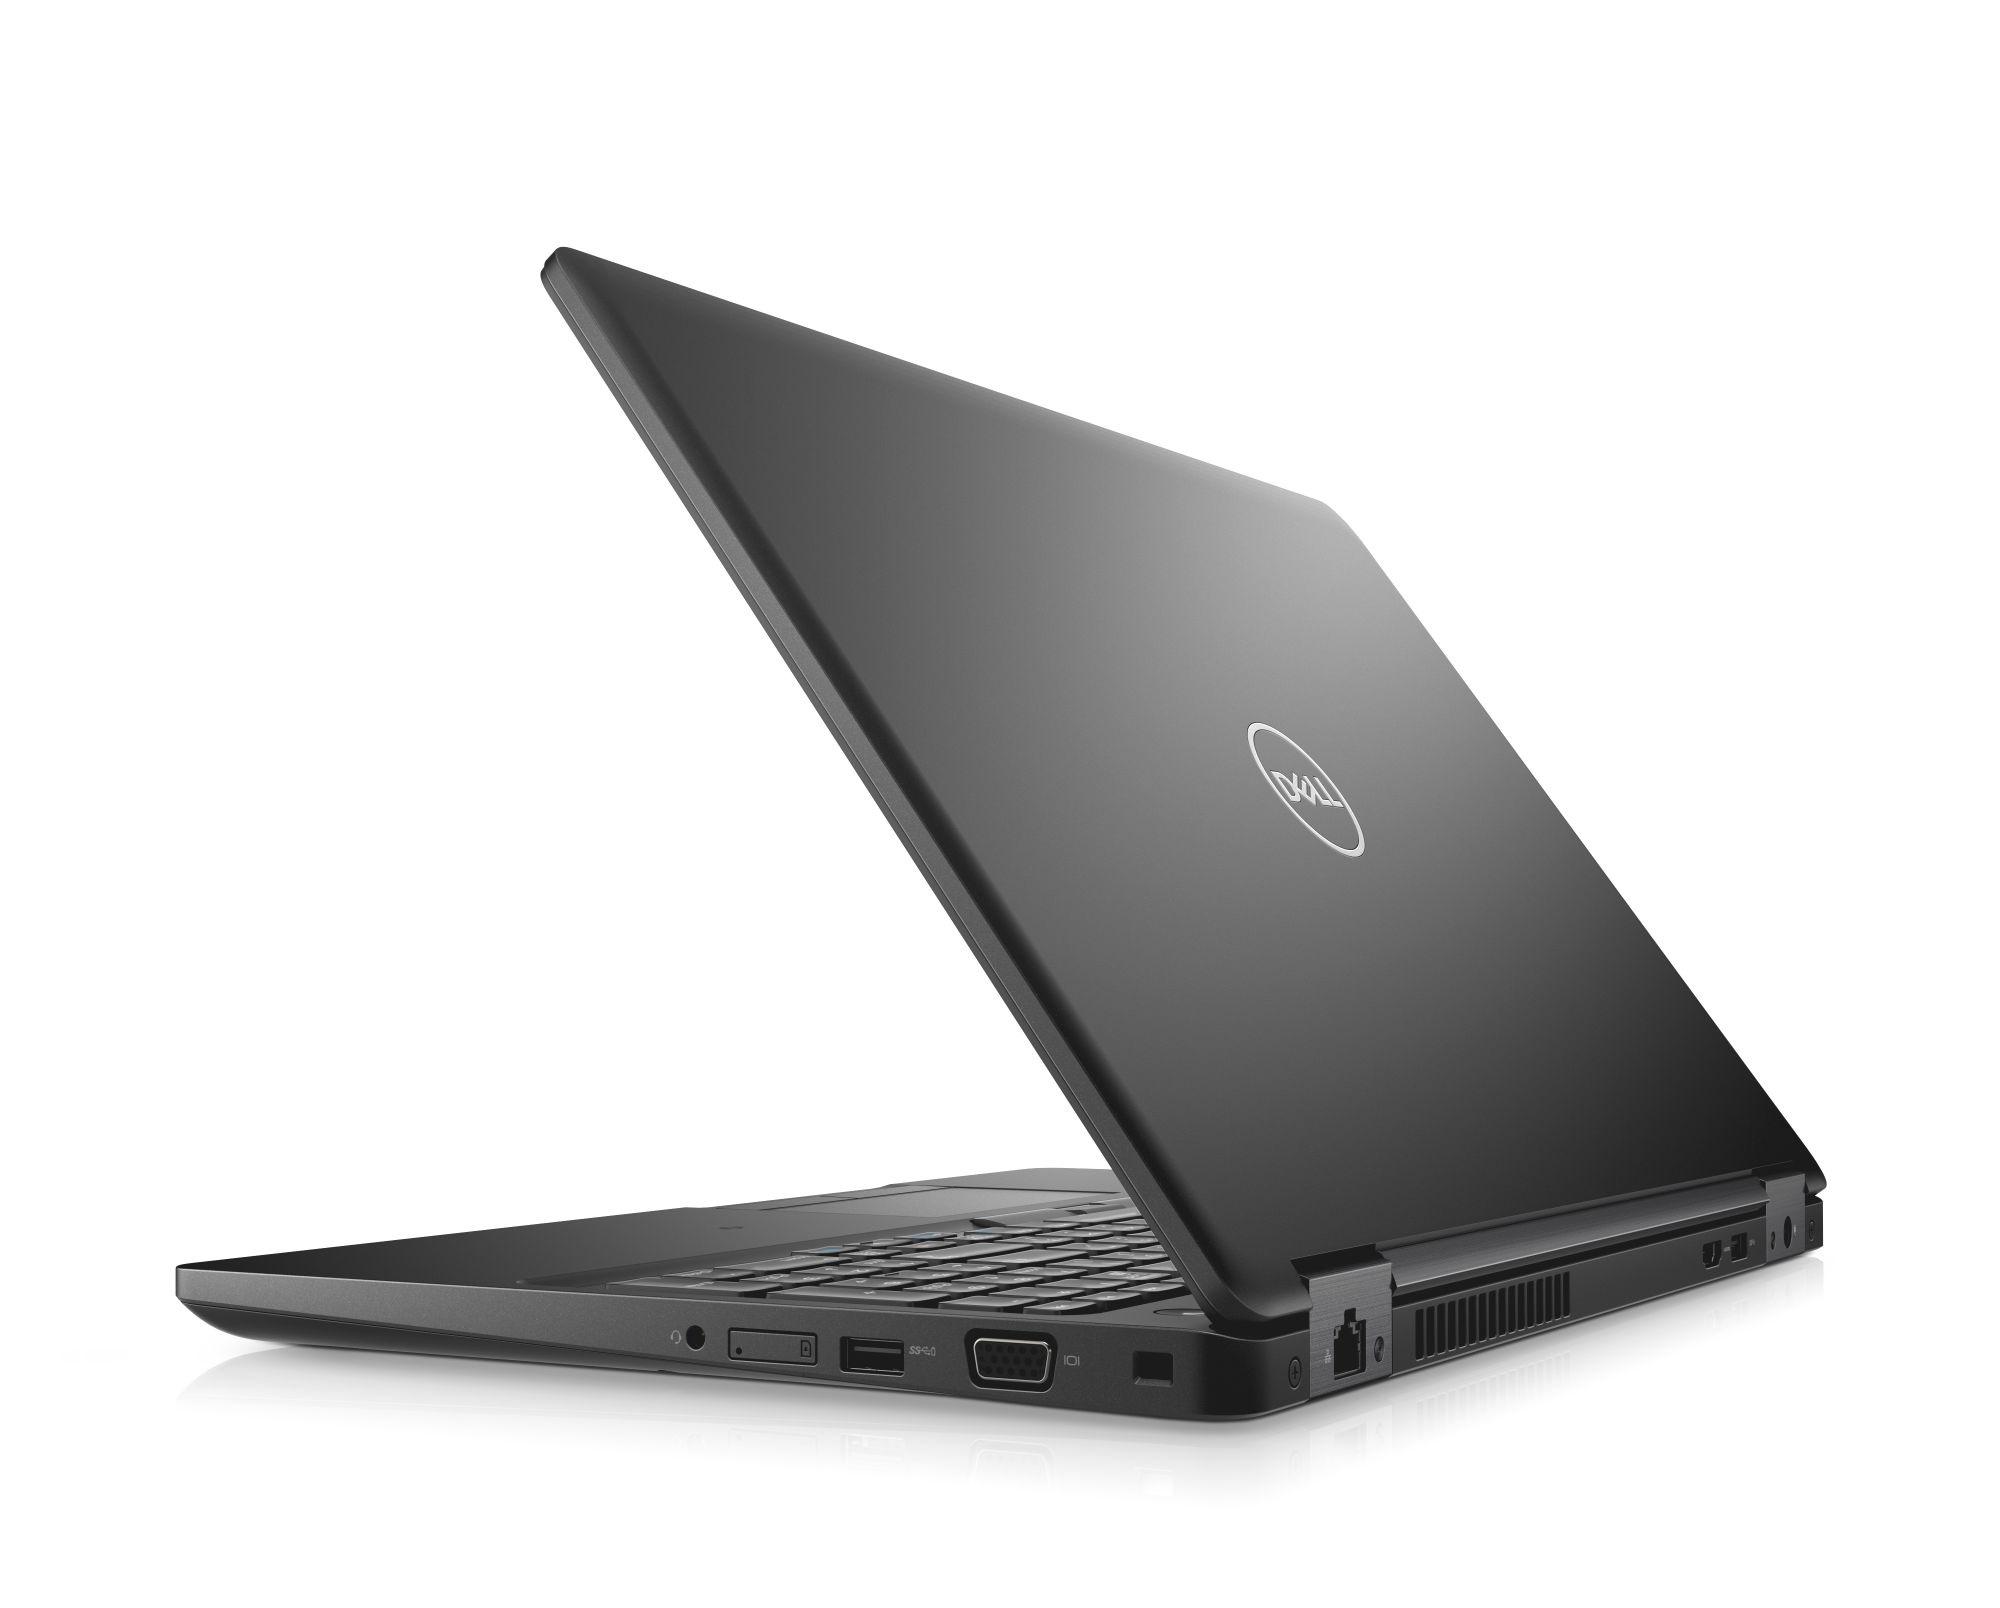 "Dell Precision 3530 15"" FHD i7-8750H/16GB/512GB SSD/P600-4GB/THB/SCR/MCR/HDMI/VGA/W10P/3RNBD/Černý"